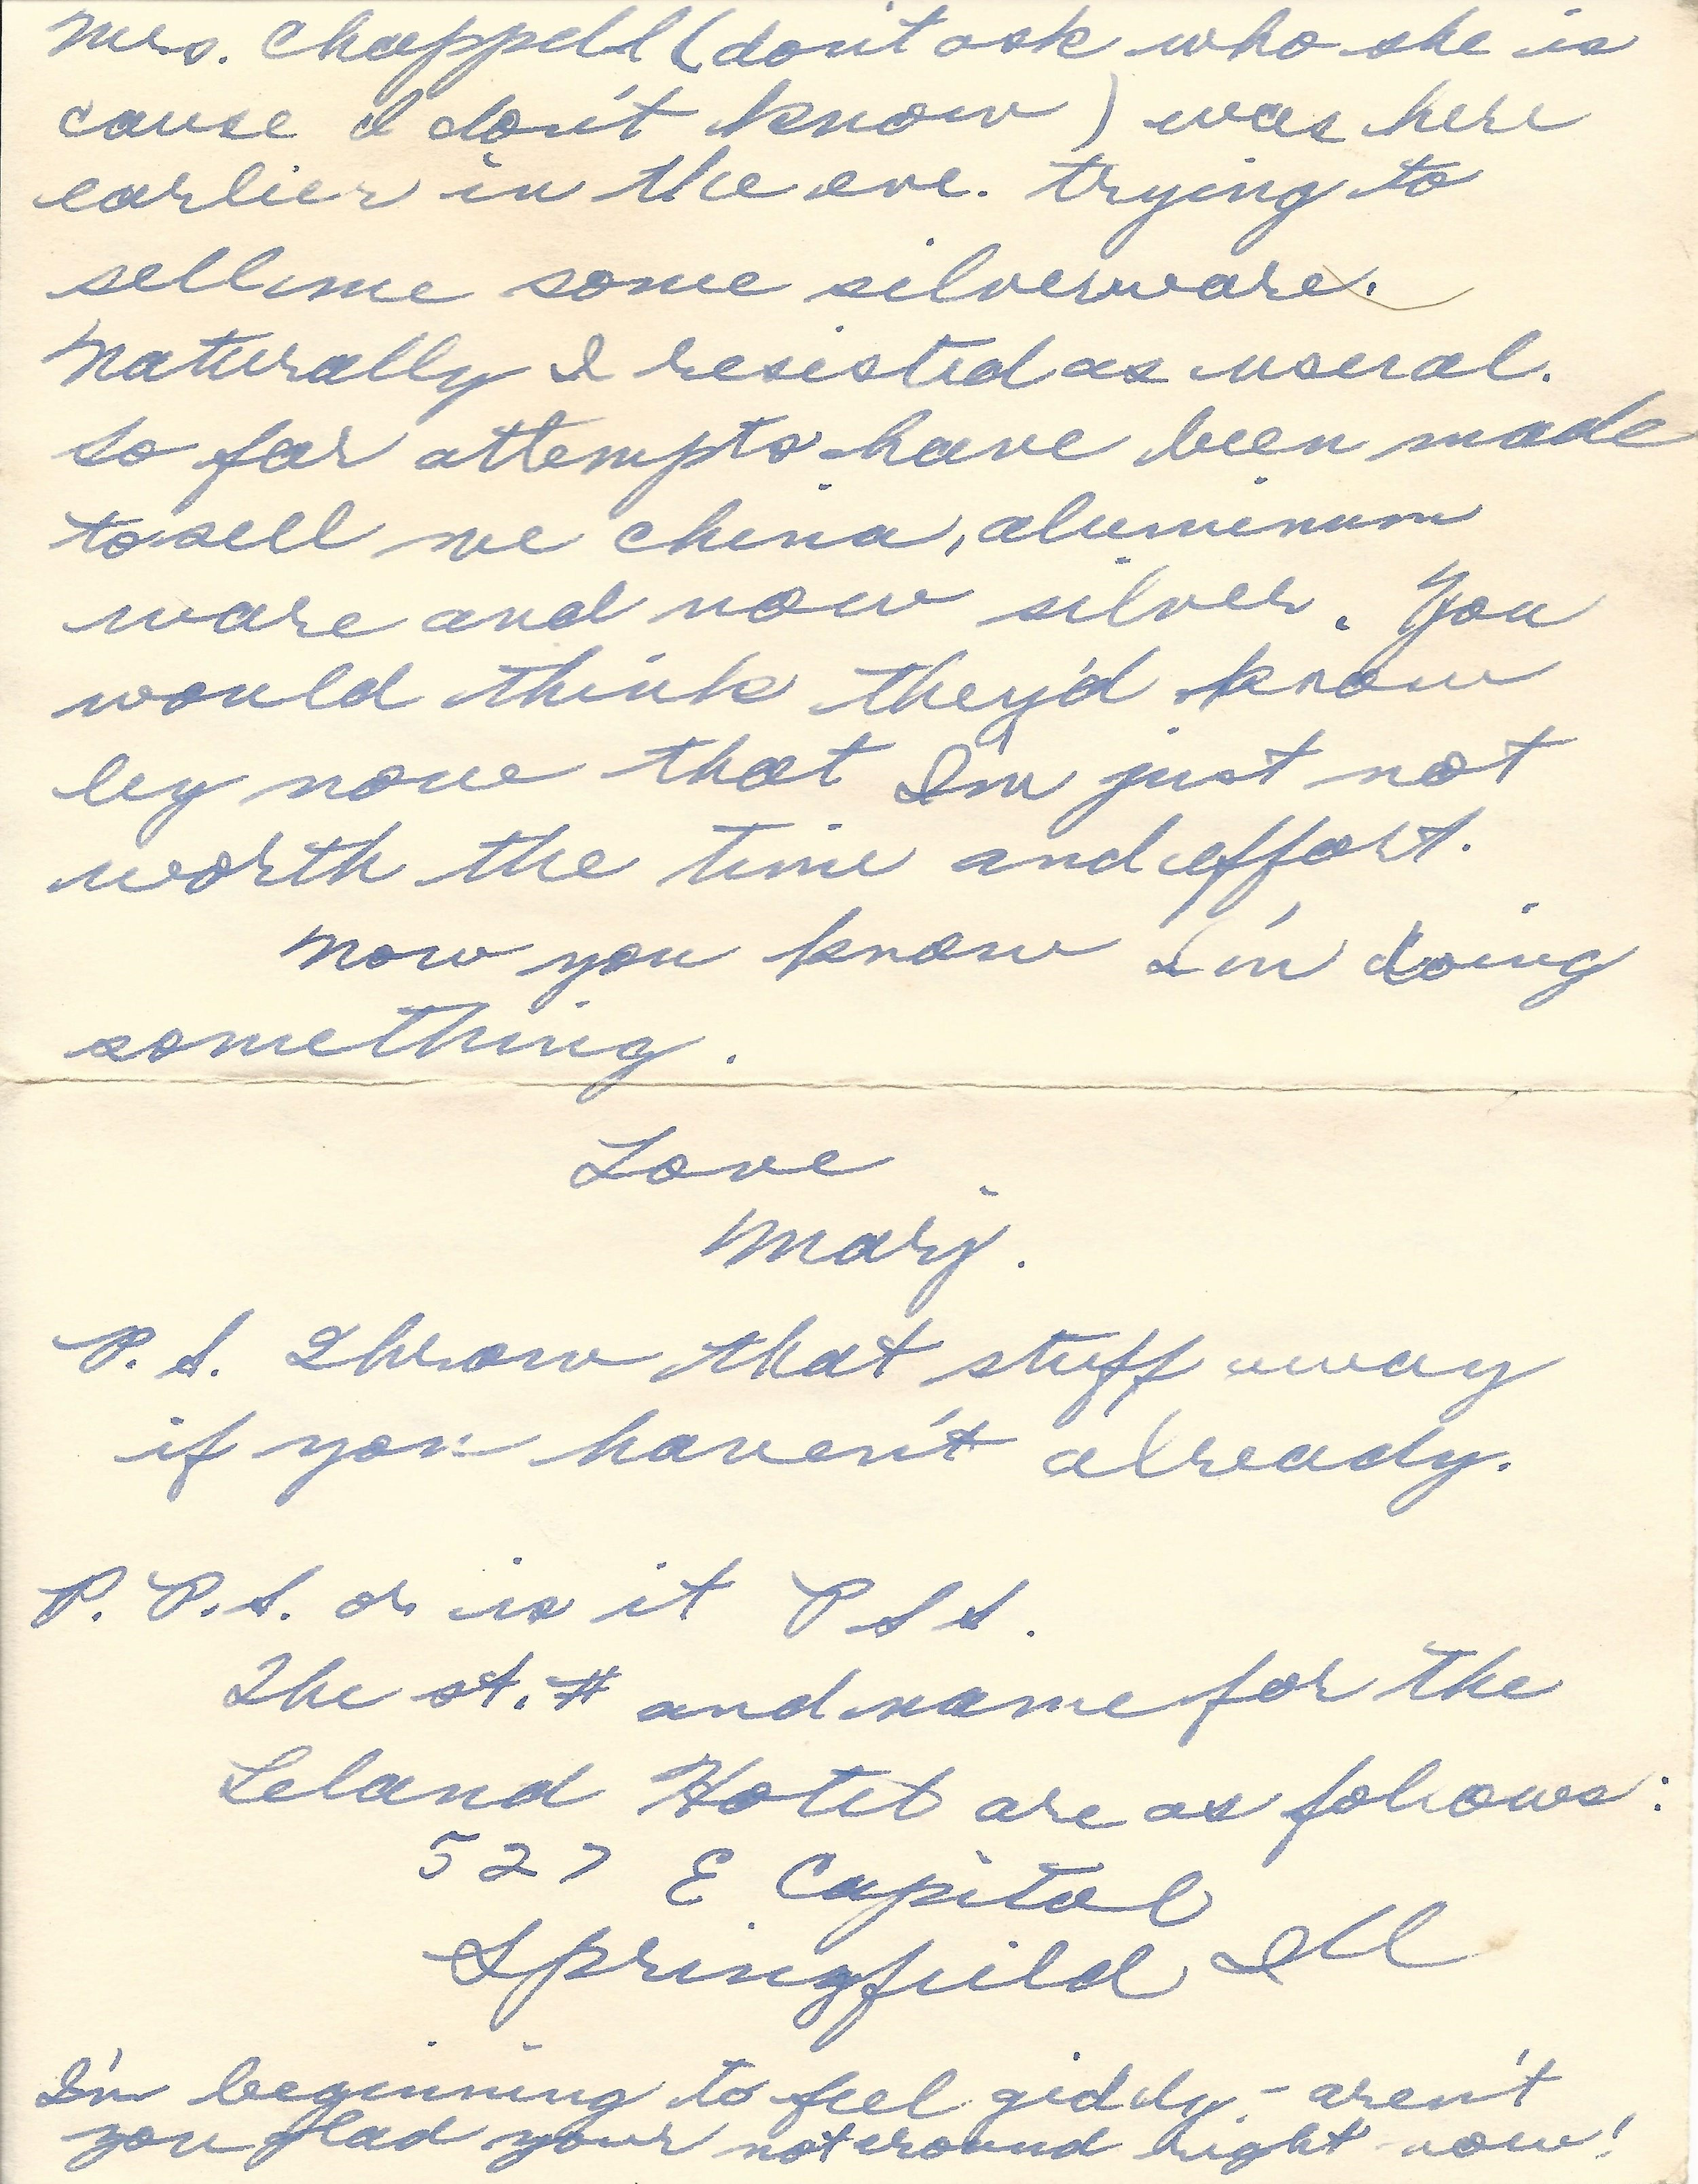 4. Nov. 5, 1952 (Oma)_Page_3.jpg